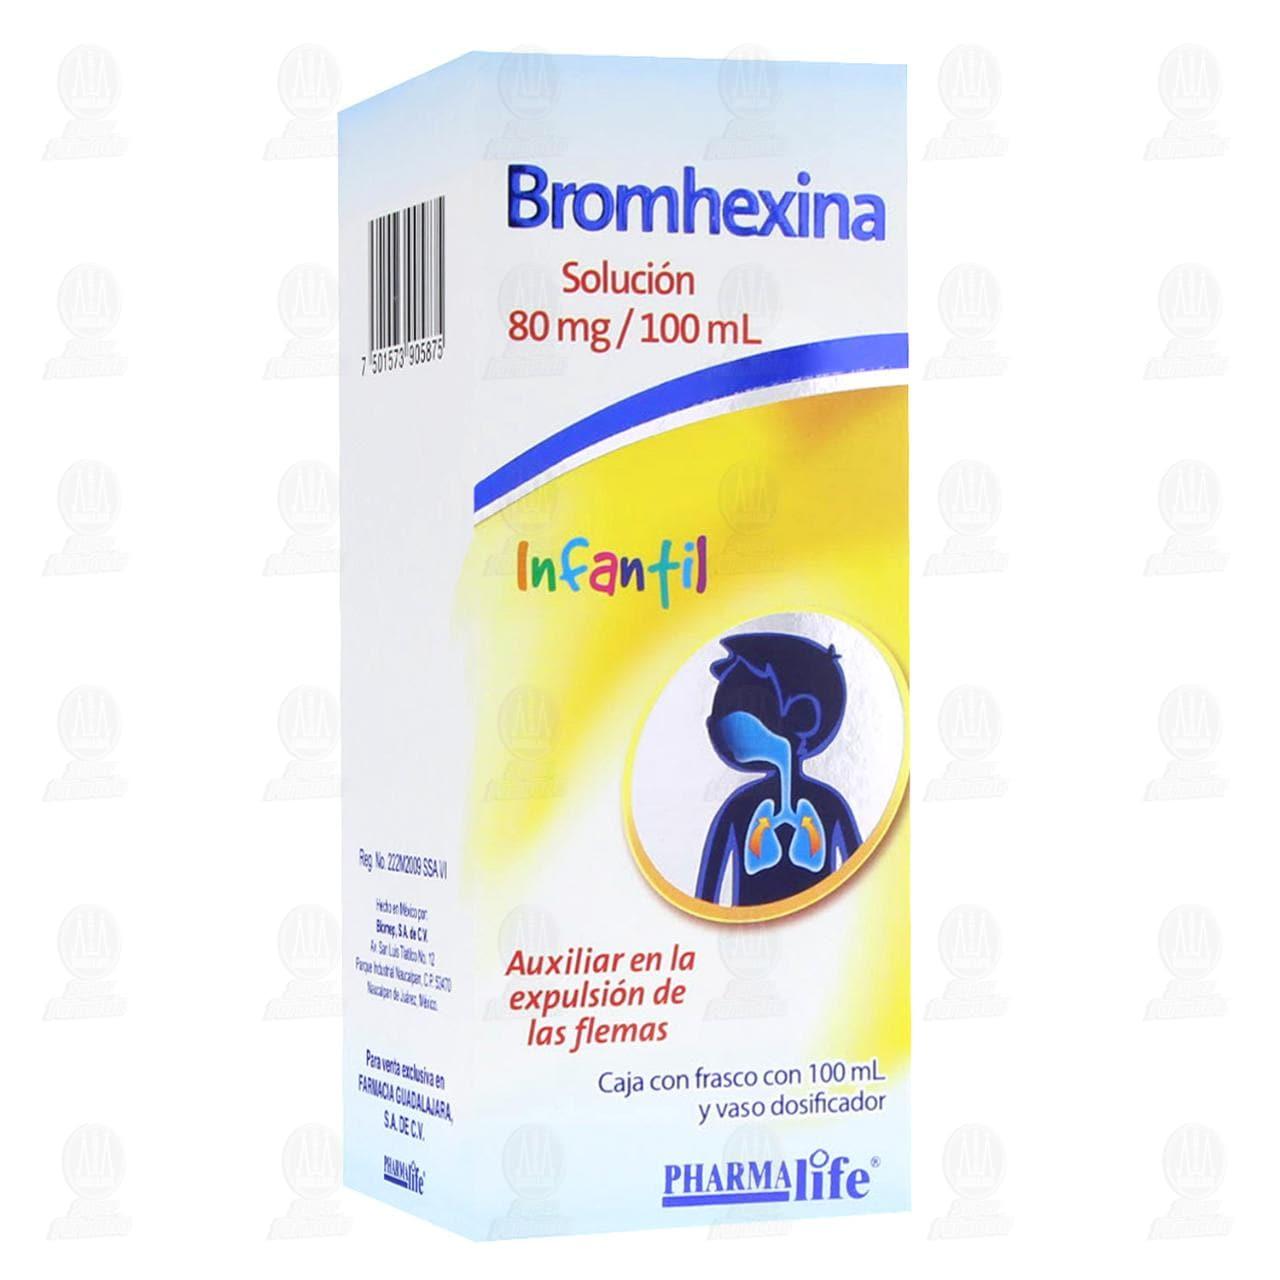 Comprar Bromhexina Solución Infantil 80mg 100ml Pharmalife en Farmacias Guadalajara